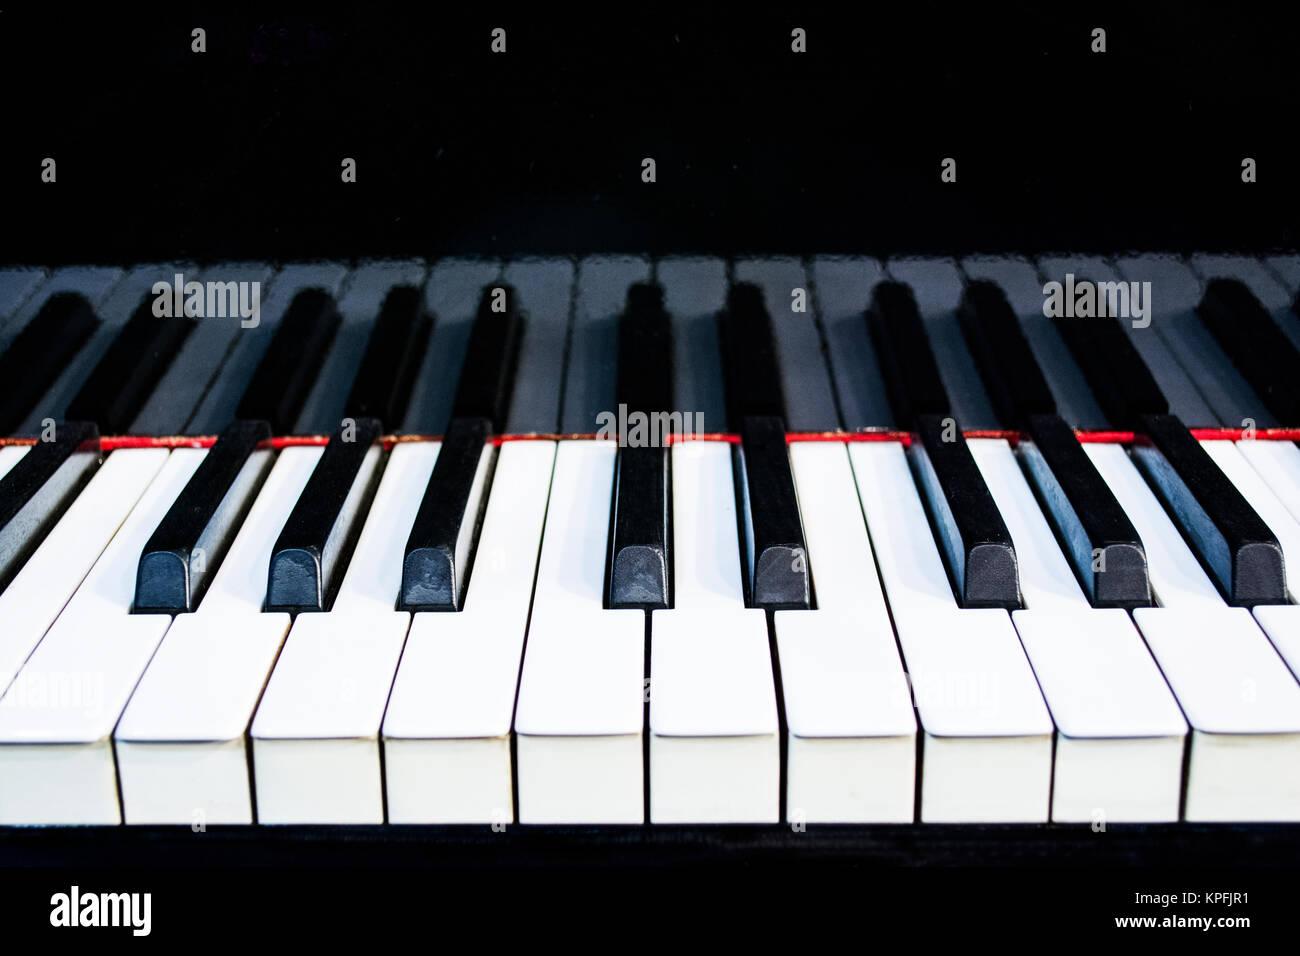 Music Note Symbol Icon Vector Stock Photos Music Note Symbol Icon